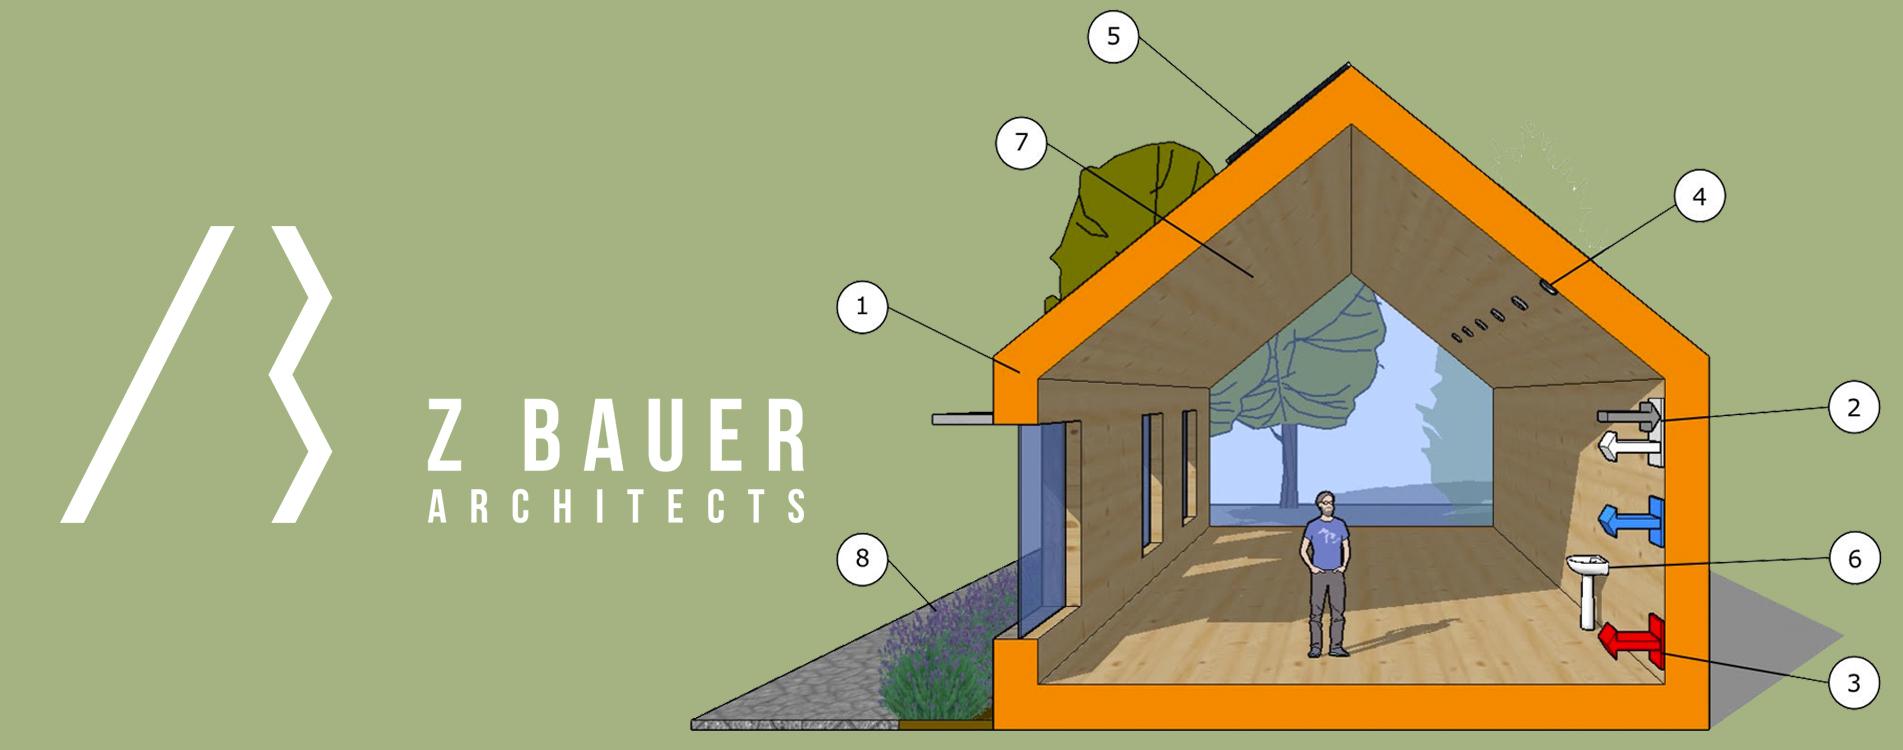 Zohrab Bauer Architects Green 8